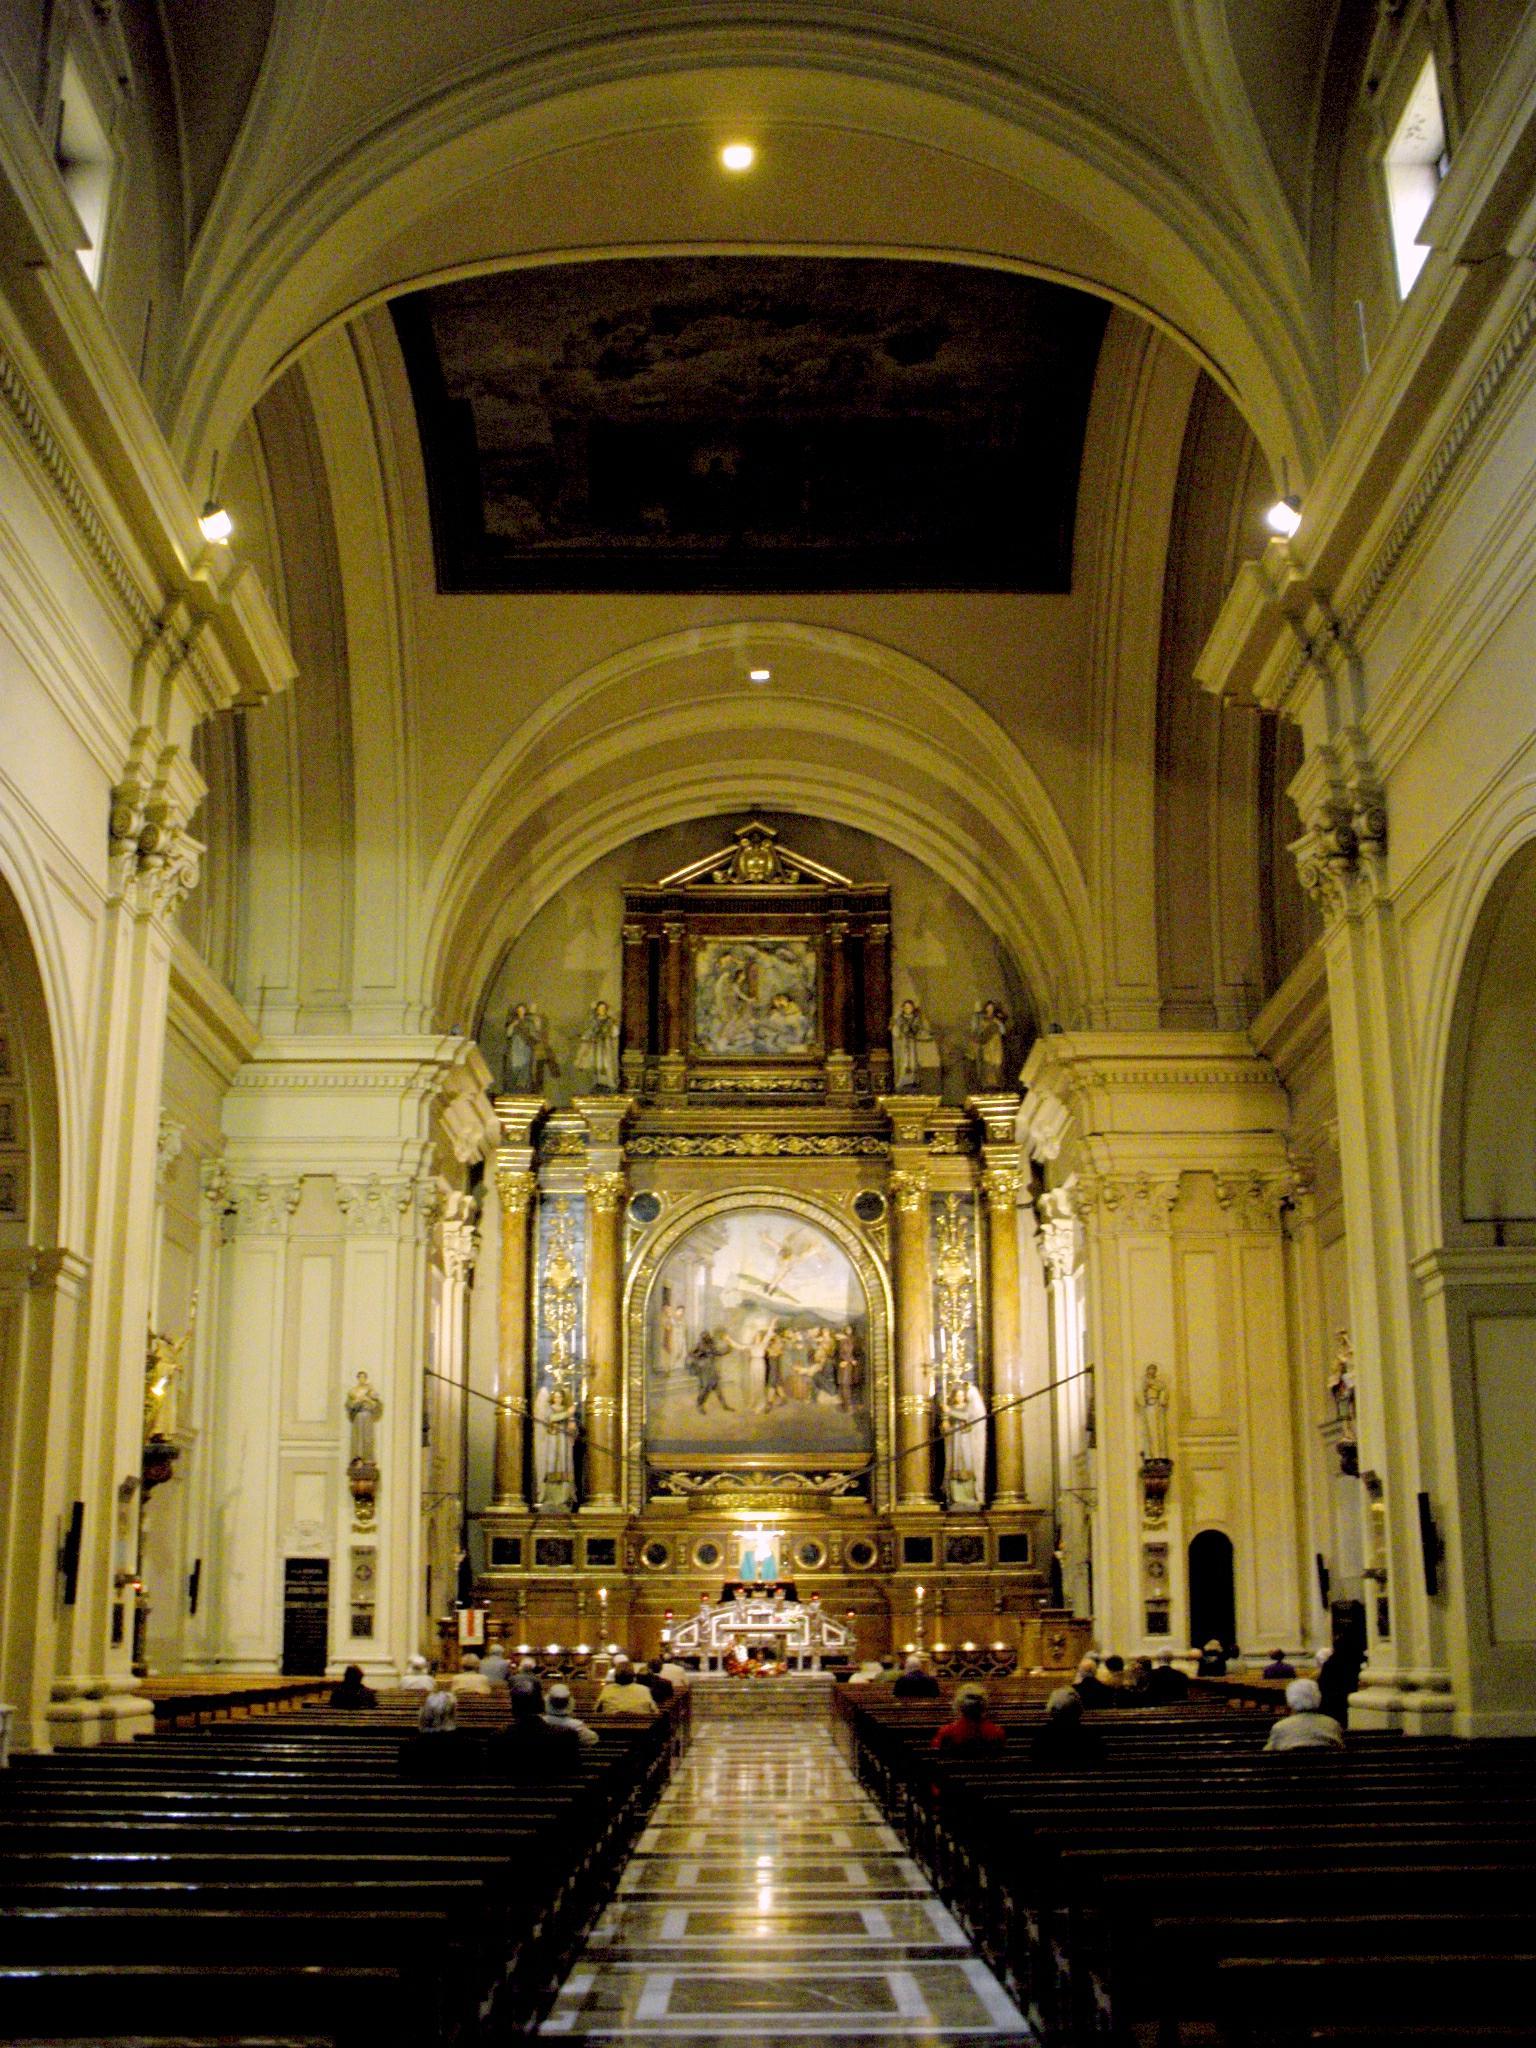 File:Zaragoza - Iglesia basílica de Santa Engracia 02.JPG - Wikimedia Commons